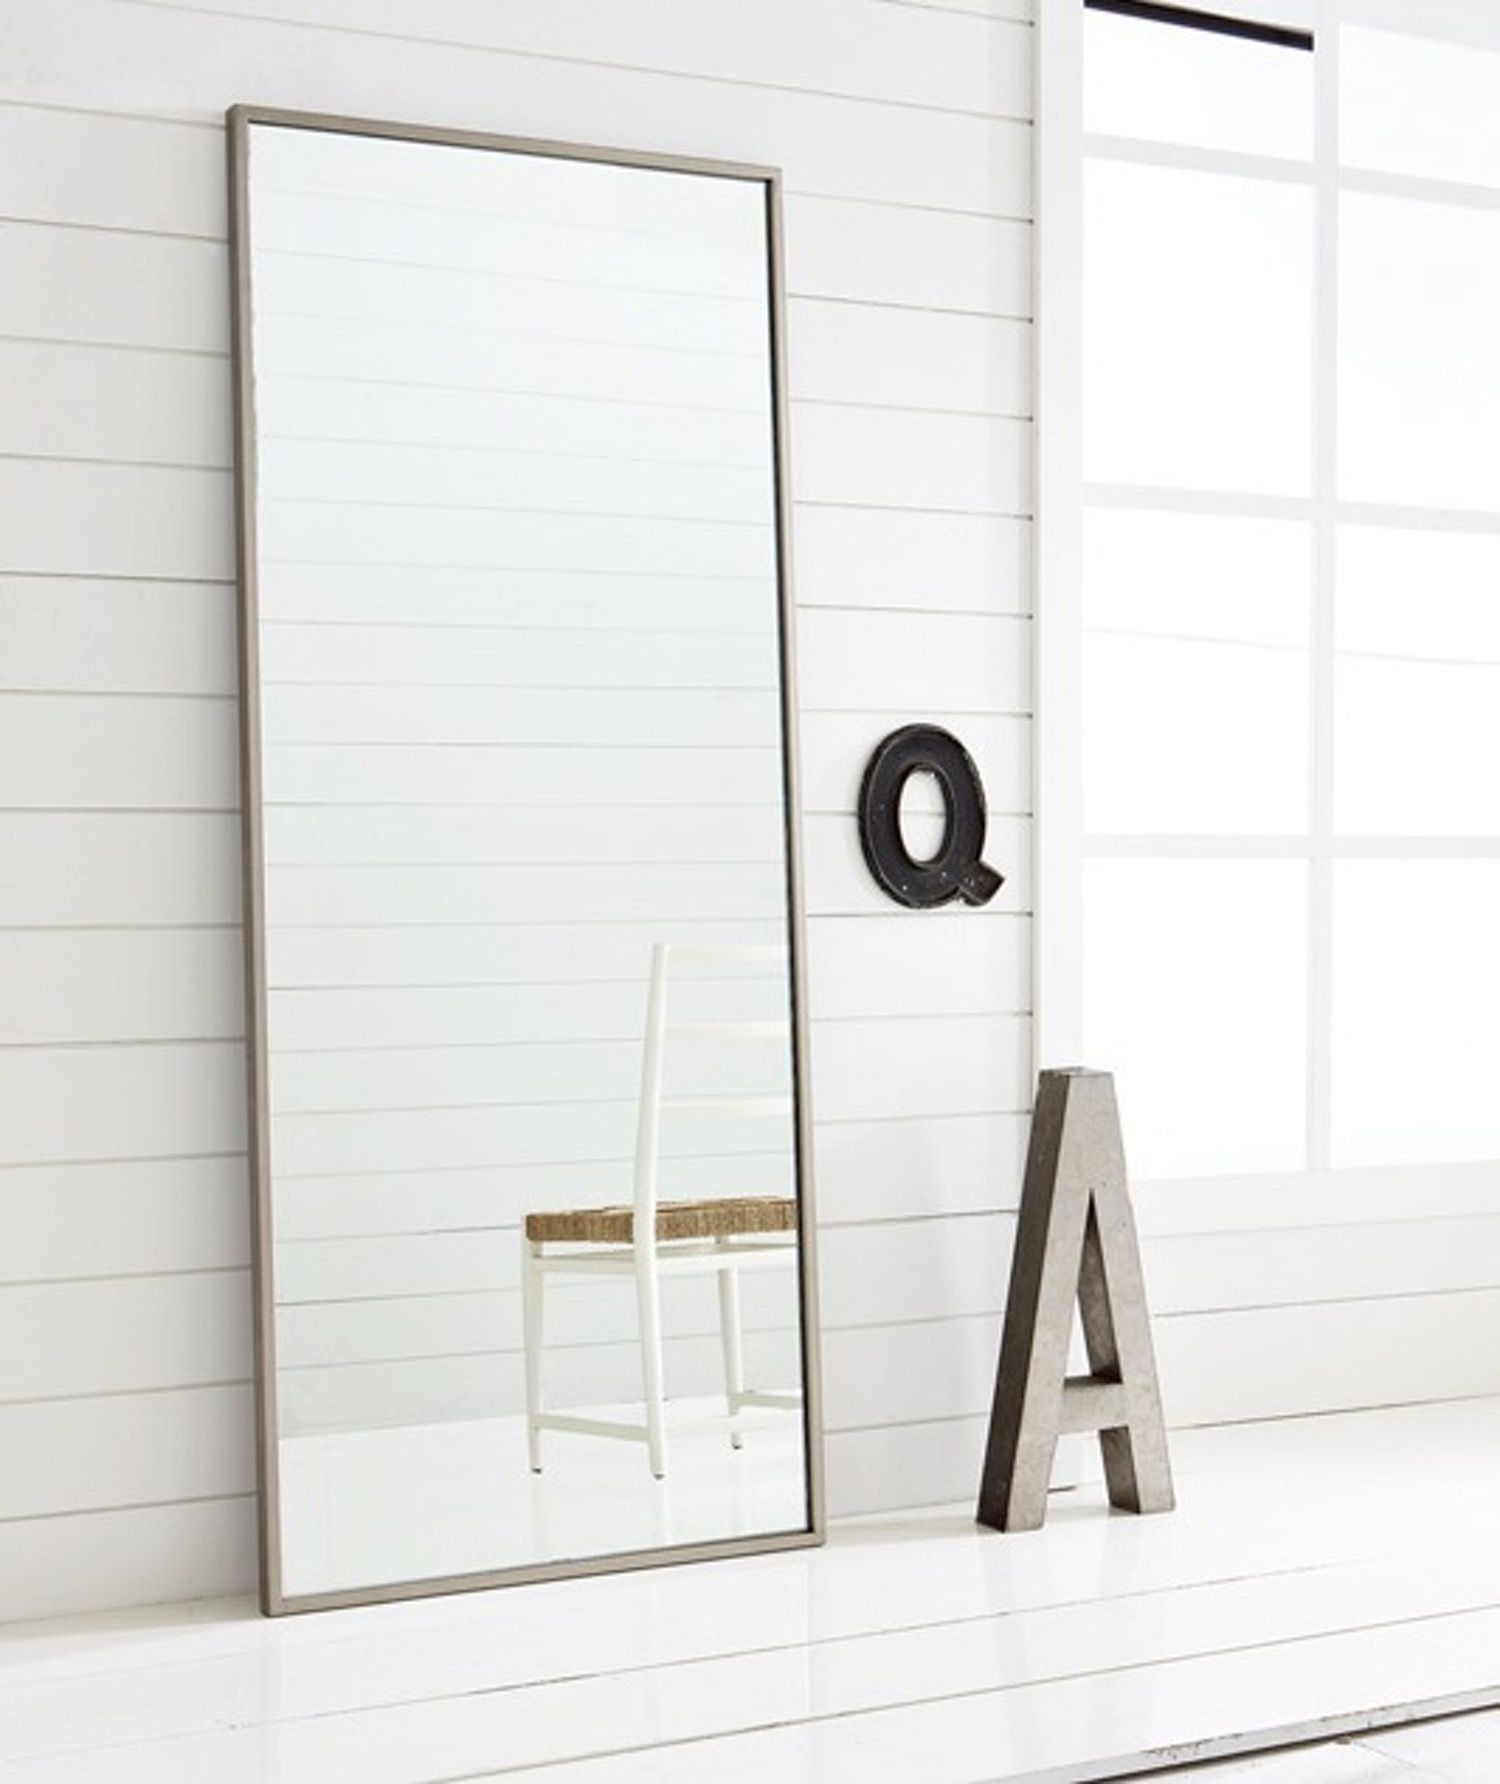 Roundup Infinity Mirrors Ikea Hovet Mirror Infinity Mirror Ikea Mirror